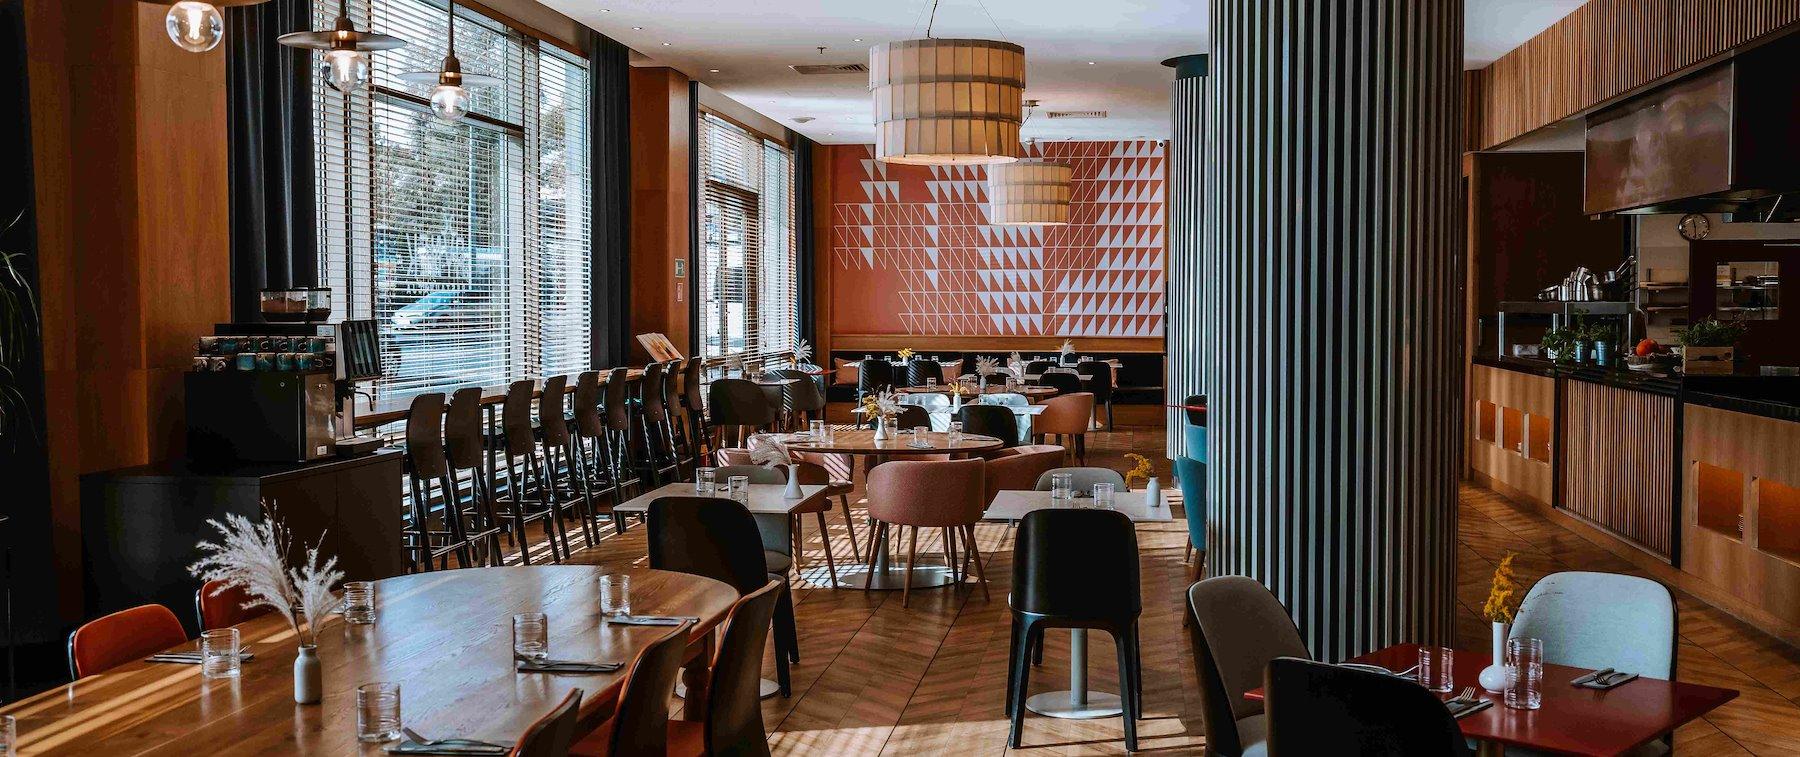 Special offers at Restaurant Rynek